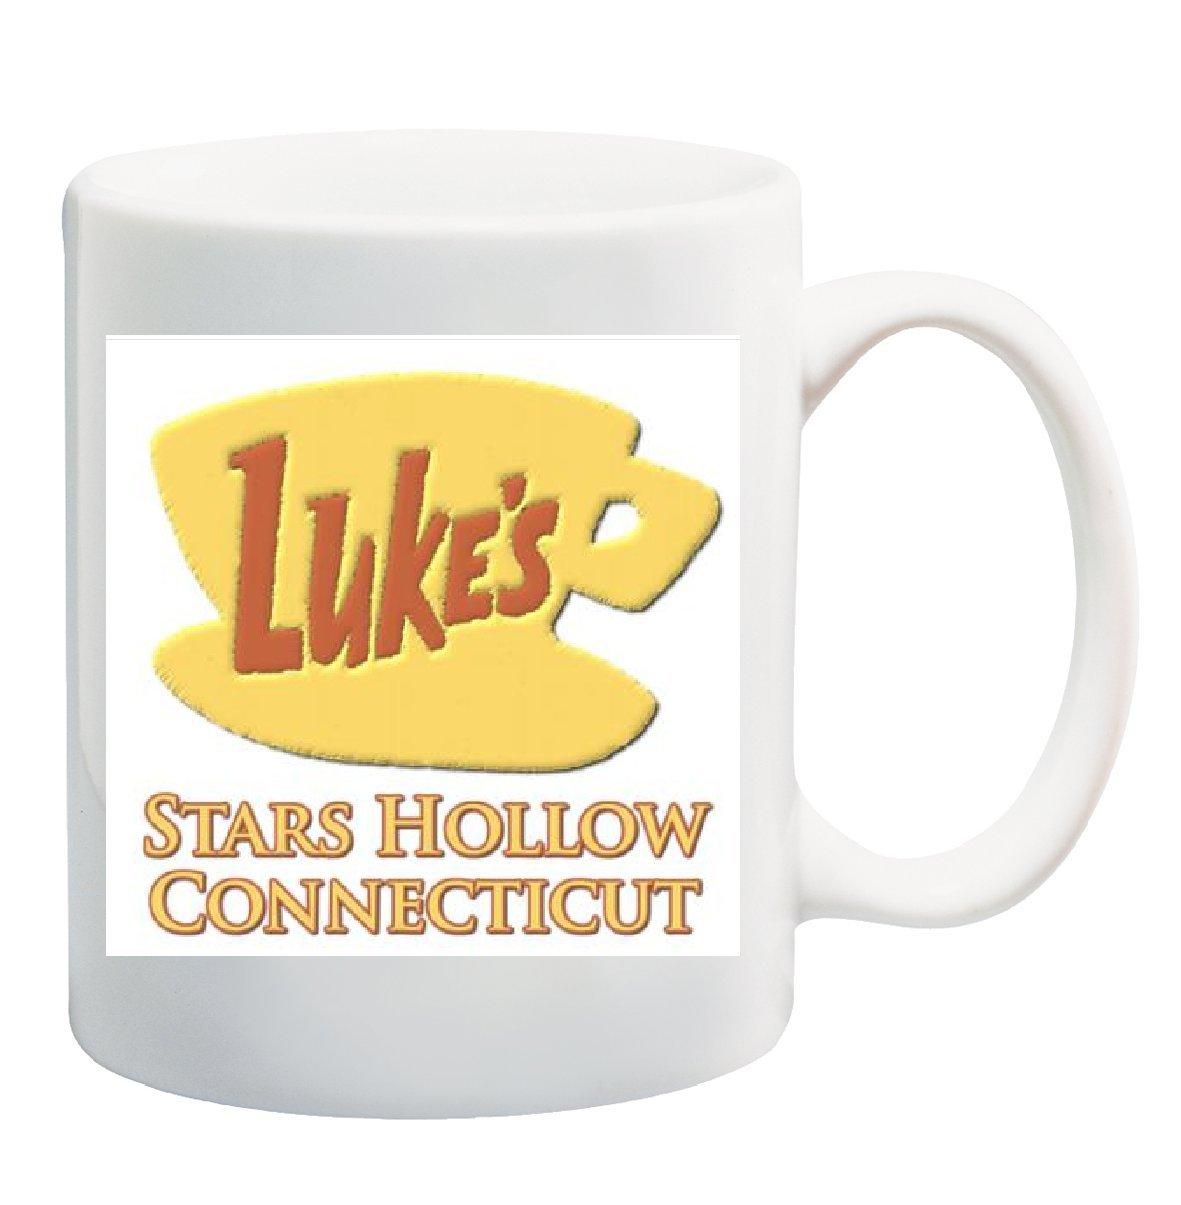 LUKE'S STARS HOLLOW CONNECTICUT Mug Cup - 11 ounces: Amazon.co.uk: Kitchen  & Home